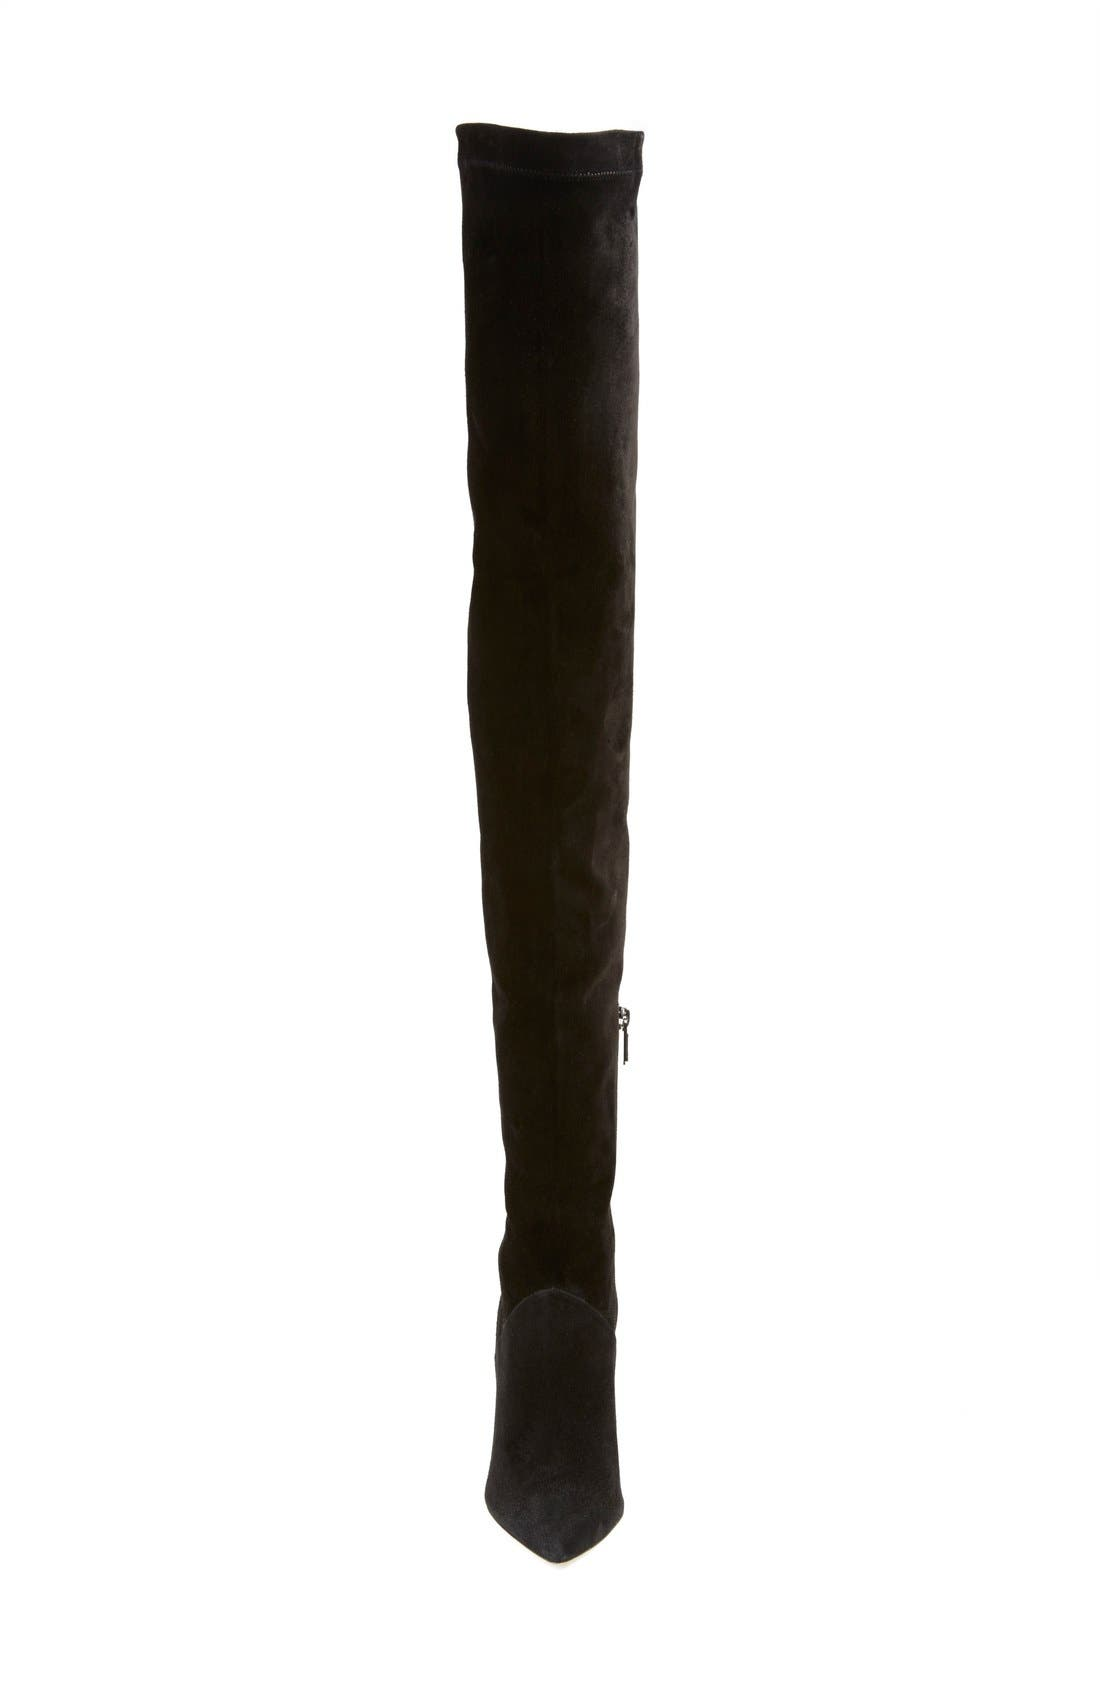 Alternate Image 3  - Paul Andrew 'Chrysler' Thigh High Boot (Women) (Narrow Calf)